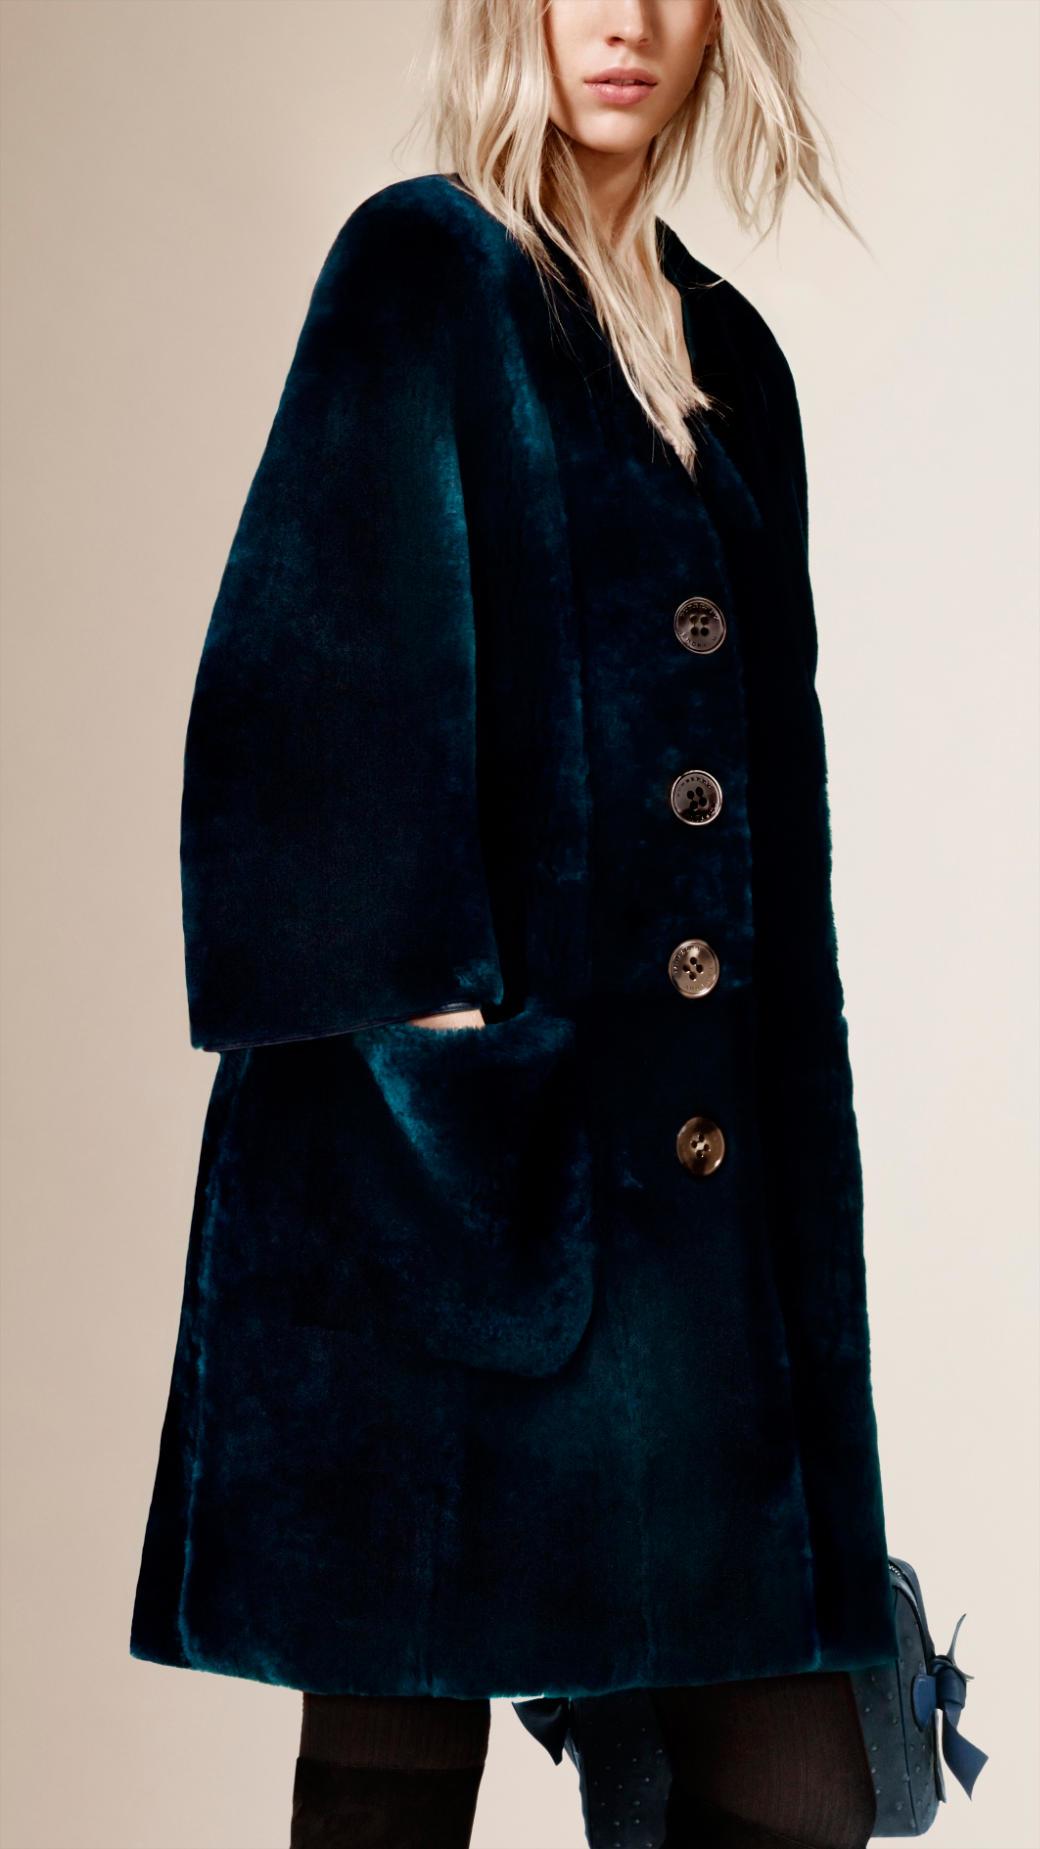 Burberry V-Neck Shearling Coat in Black | Lyst